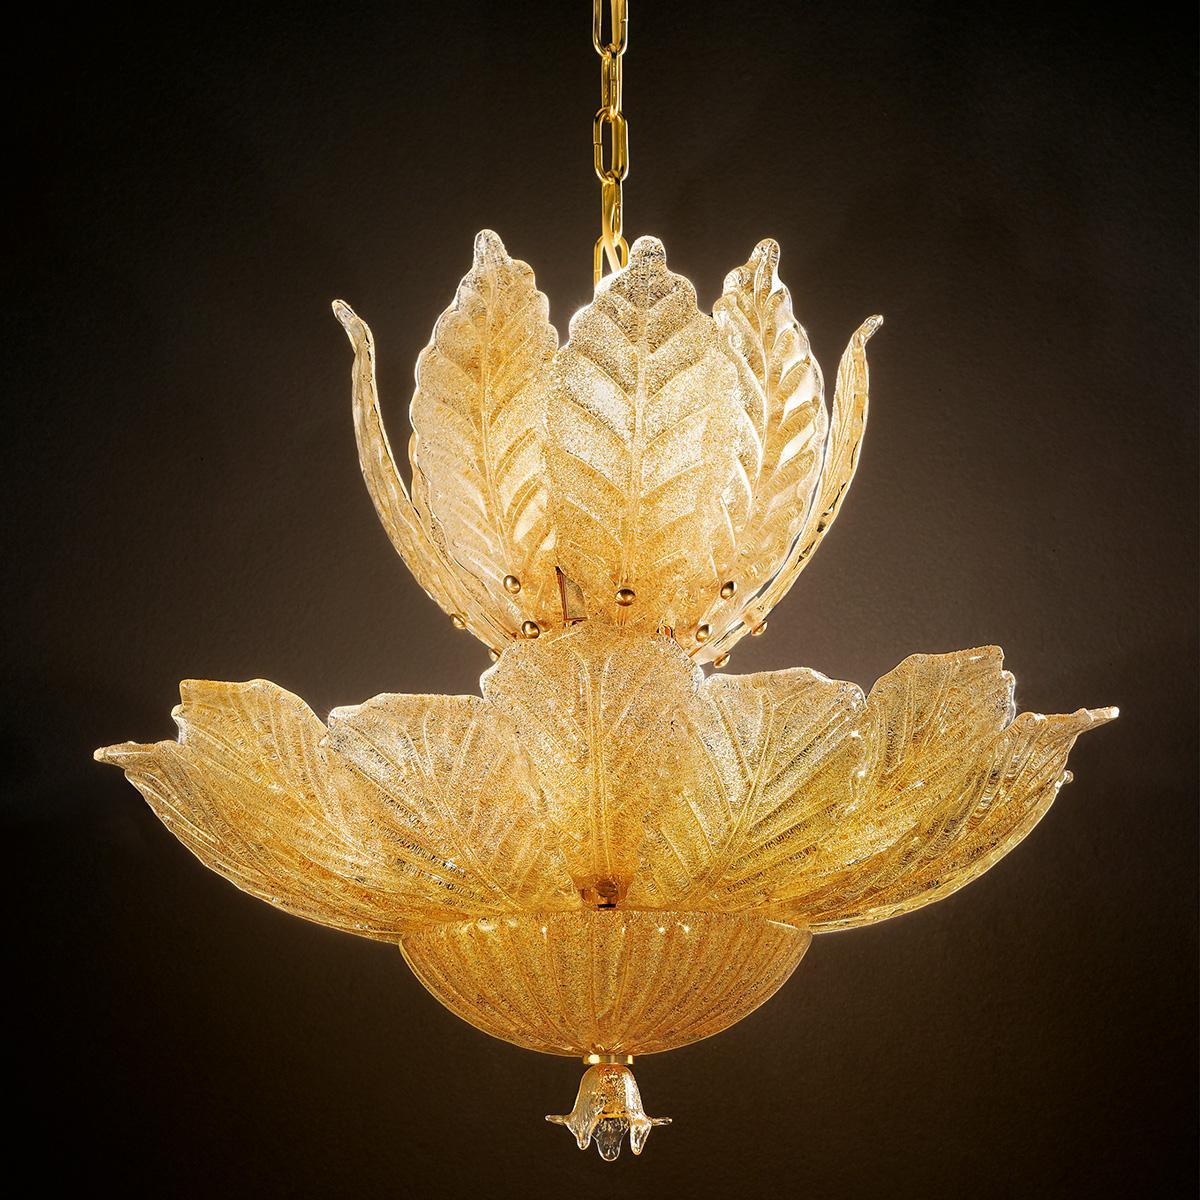 de de murano cristal colgantes lamparas R35j4ALq